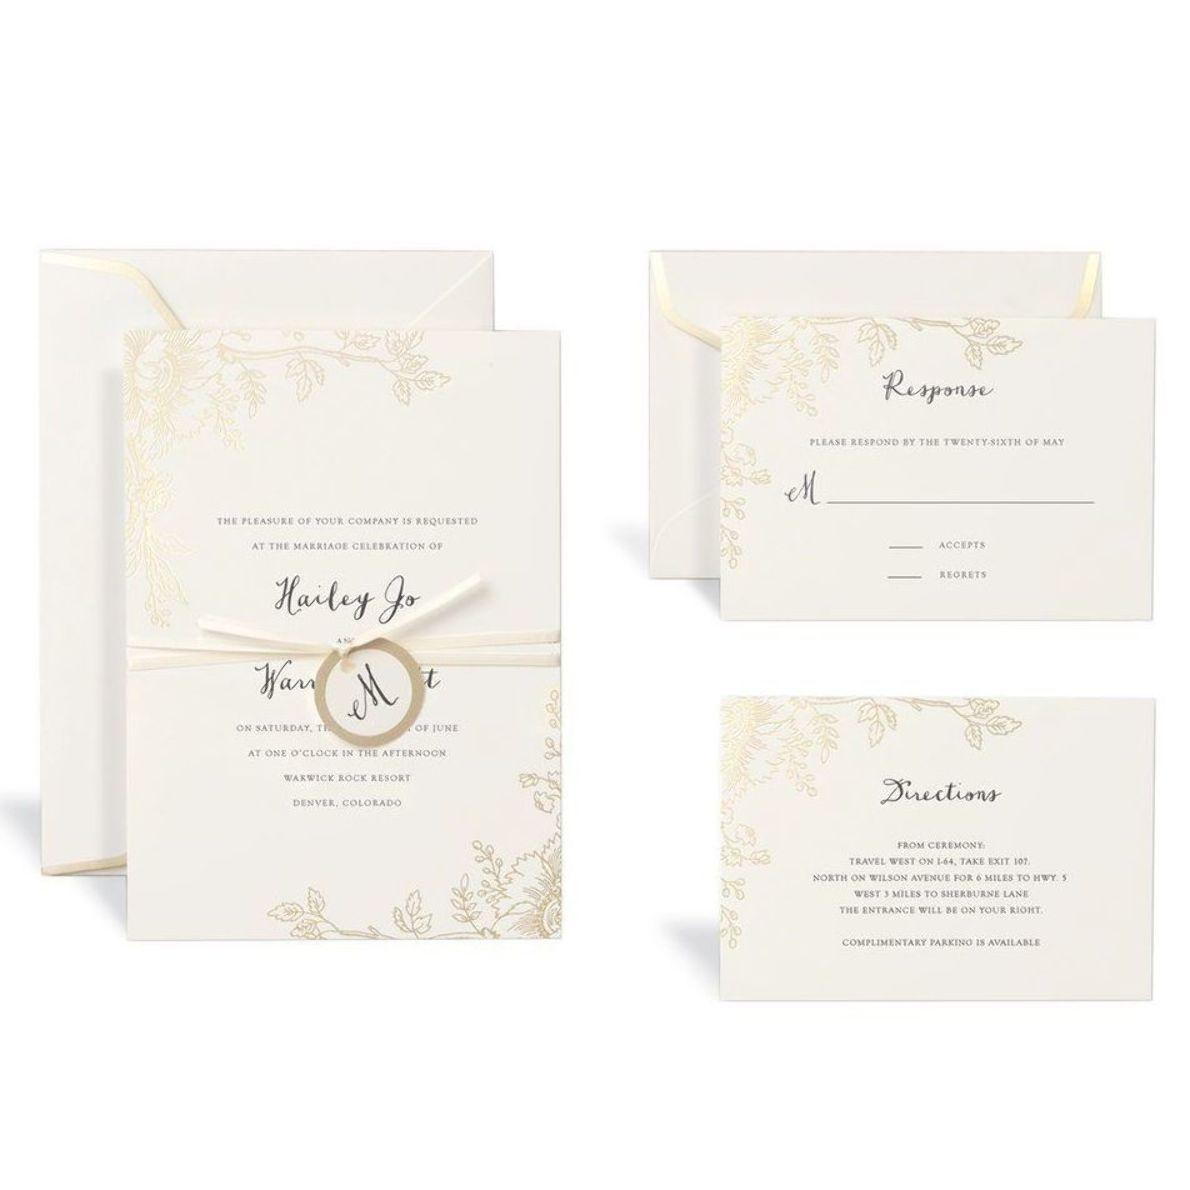 New Michaels Wedding Invites New Design Click Image To View Original Size Do Gold Wedding Invitations Fun Wedding Invitations Wedding Invitation Kits